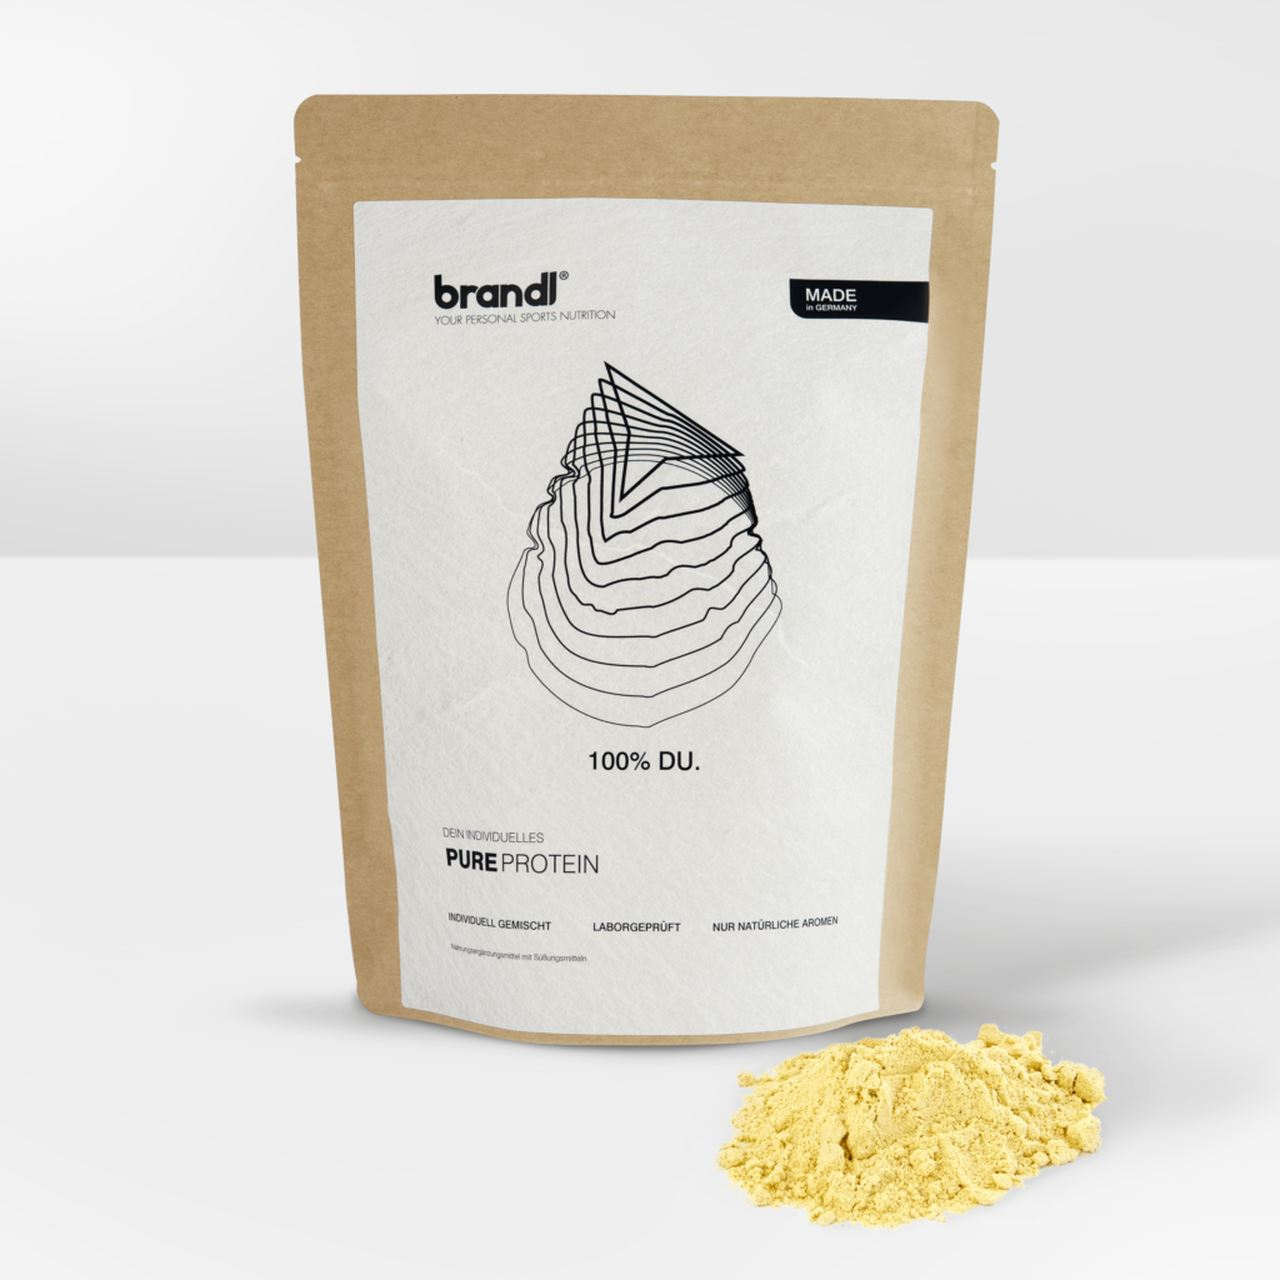 Brandl Pure Protein - Vanilla Sky 600g